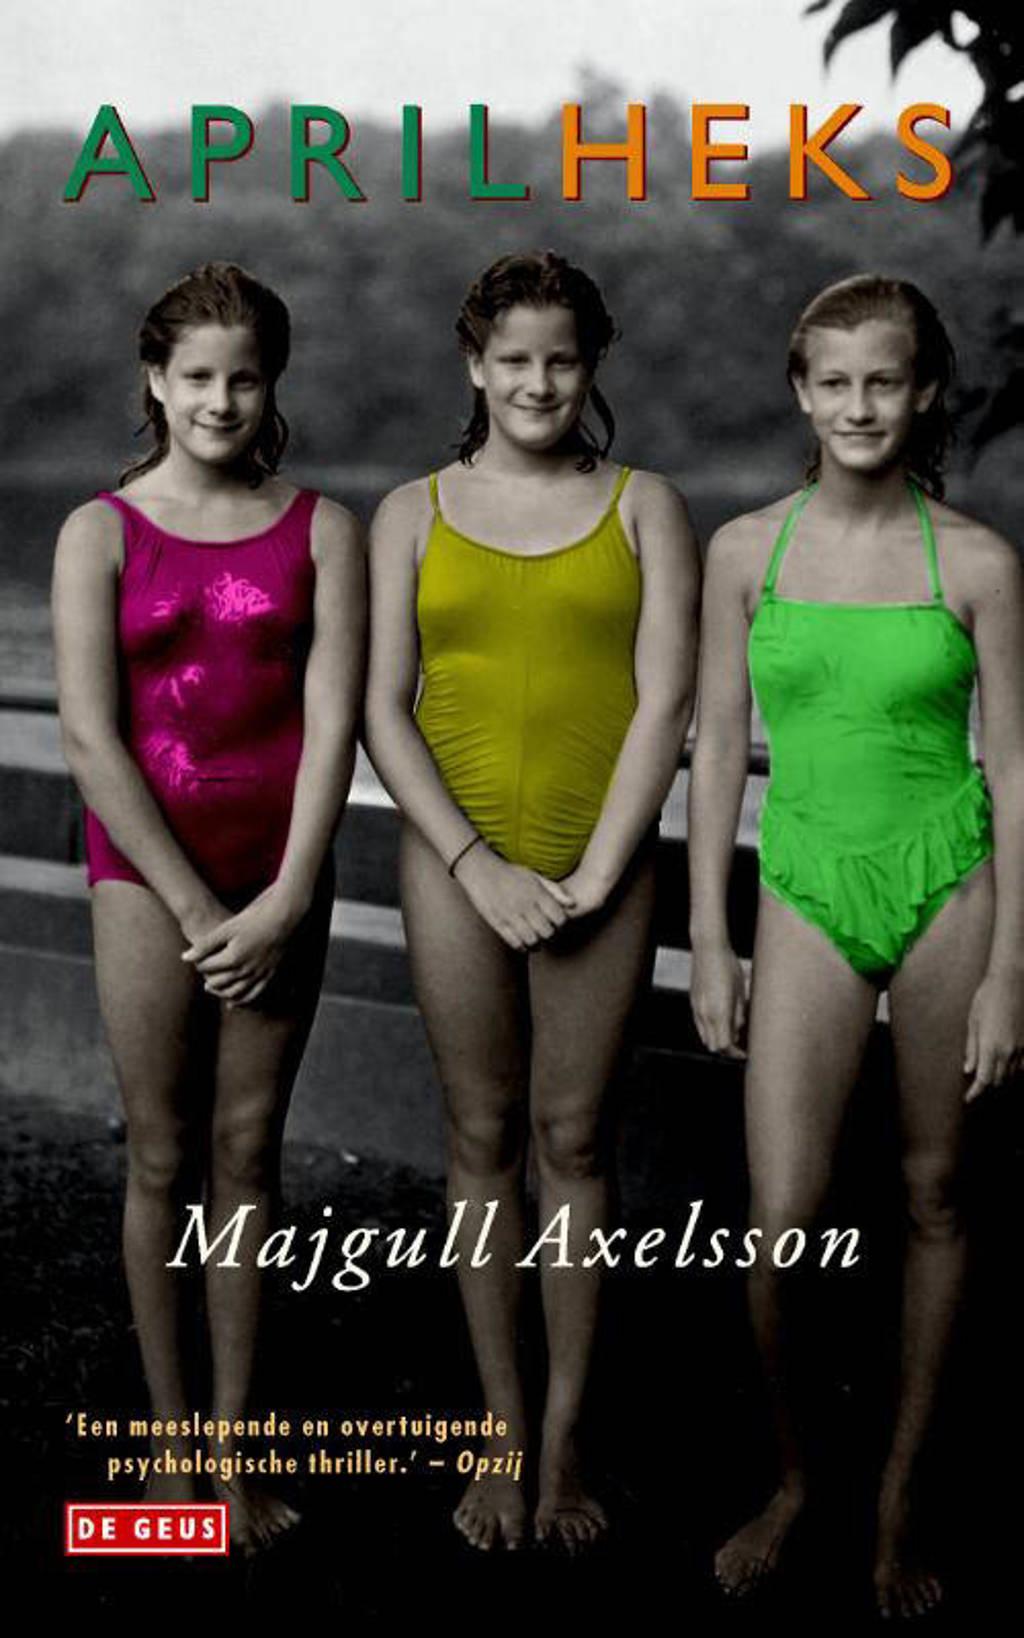 Aprilheks - Majgull Axelsson